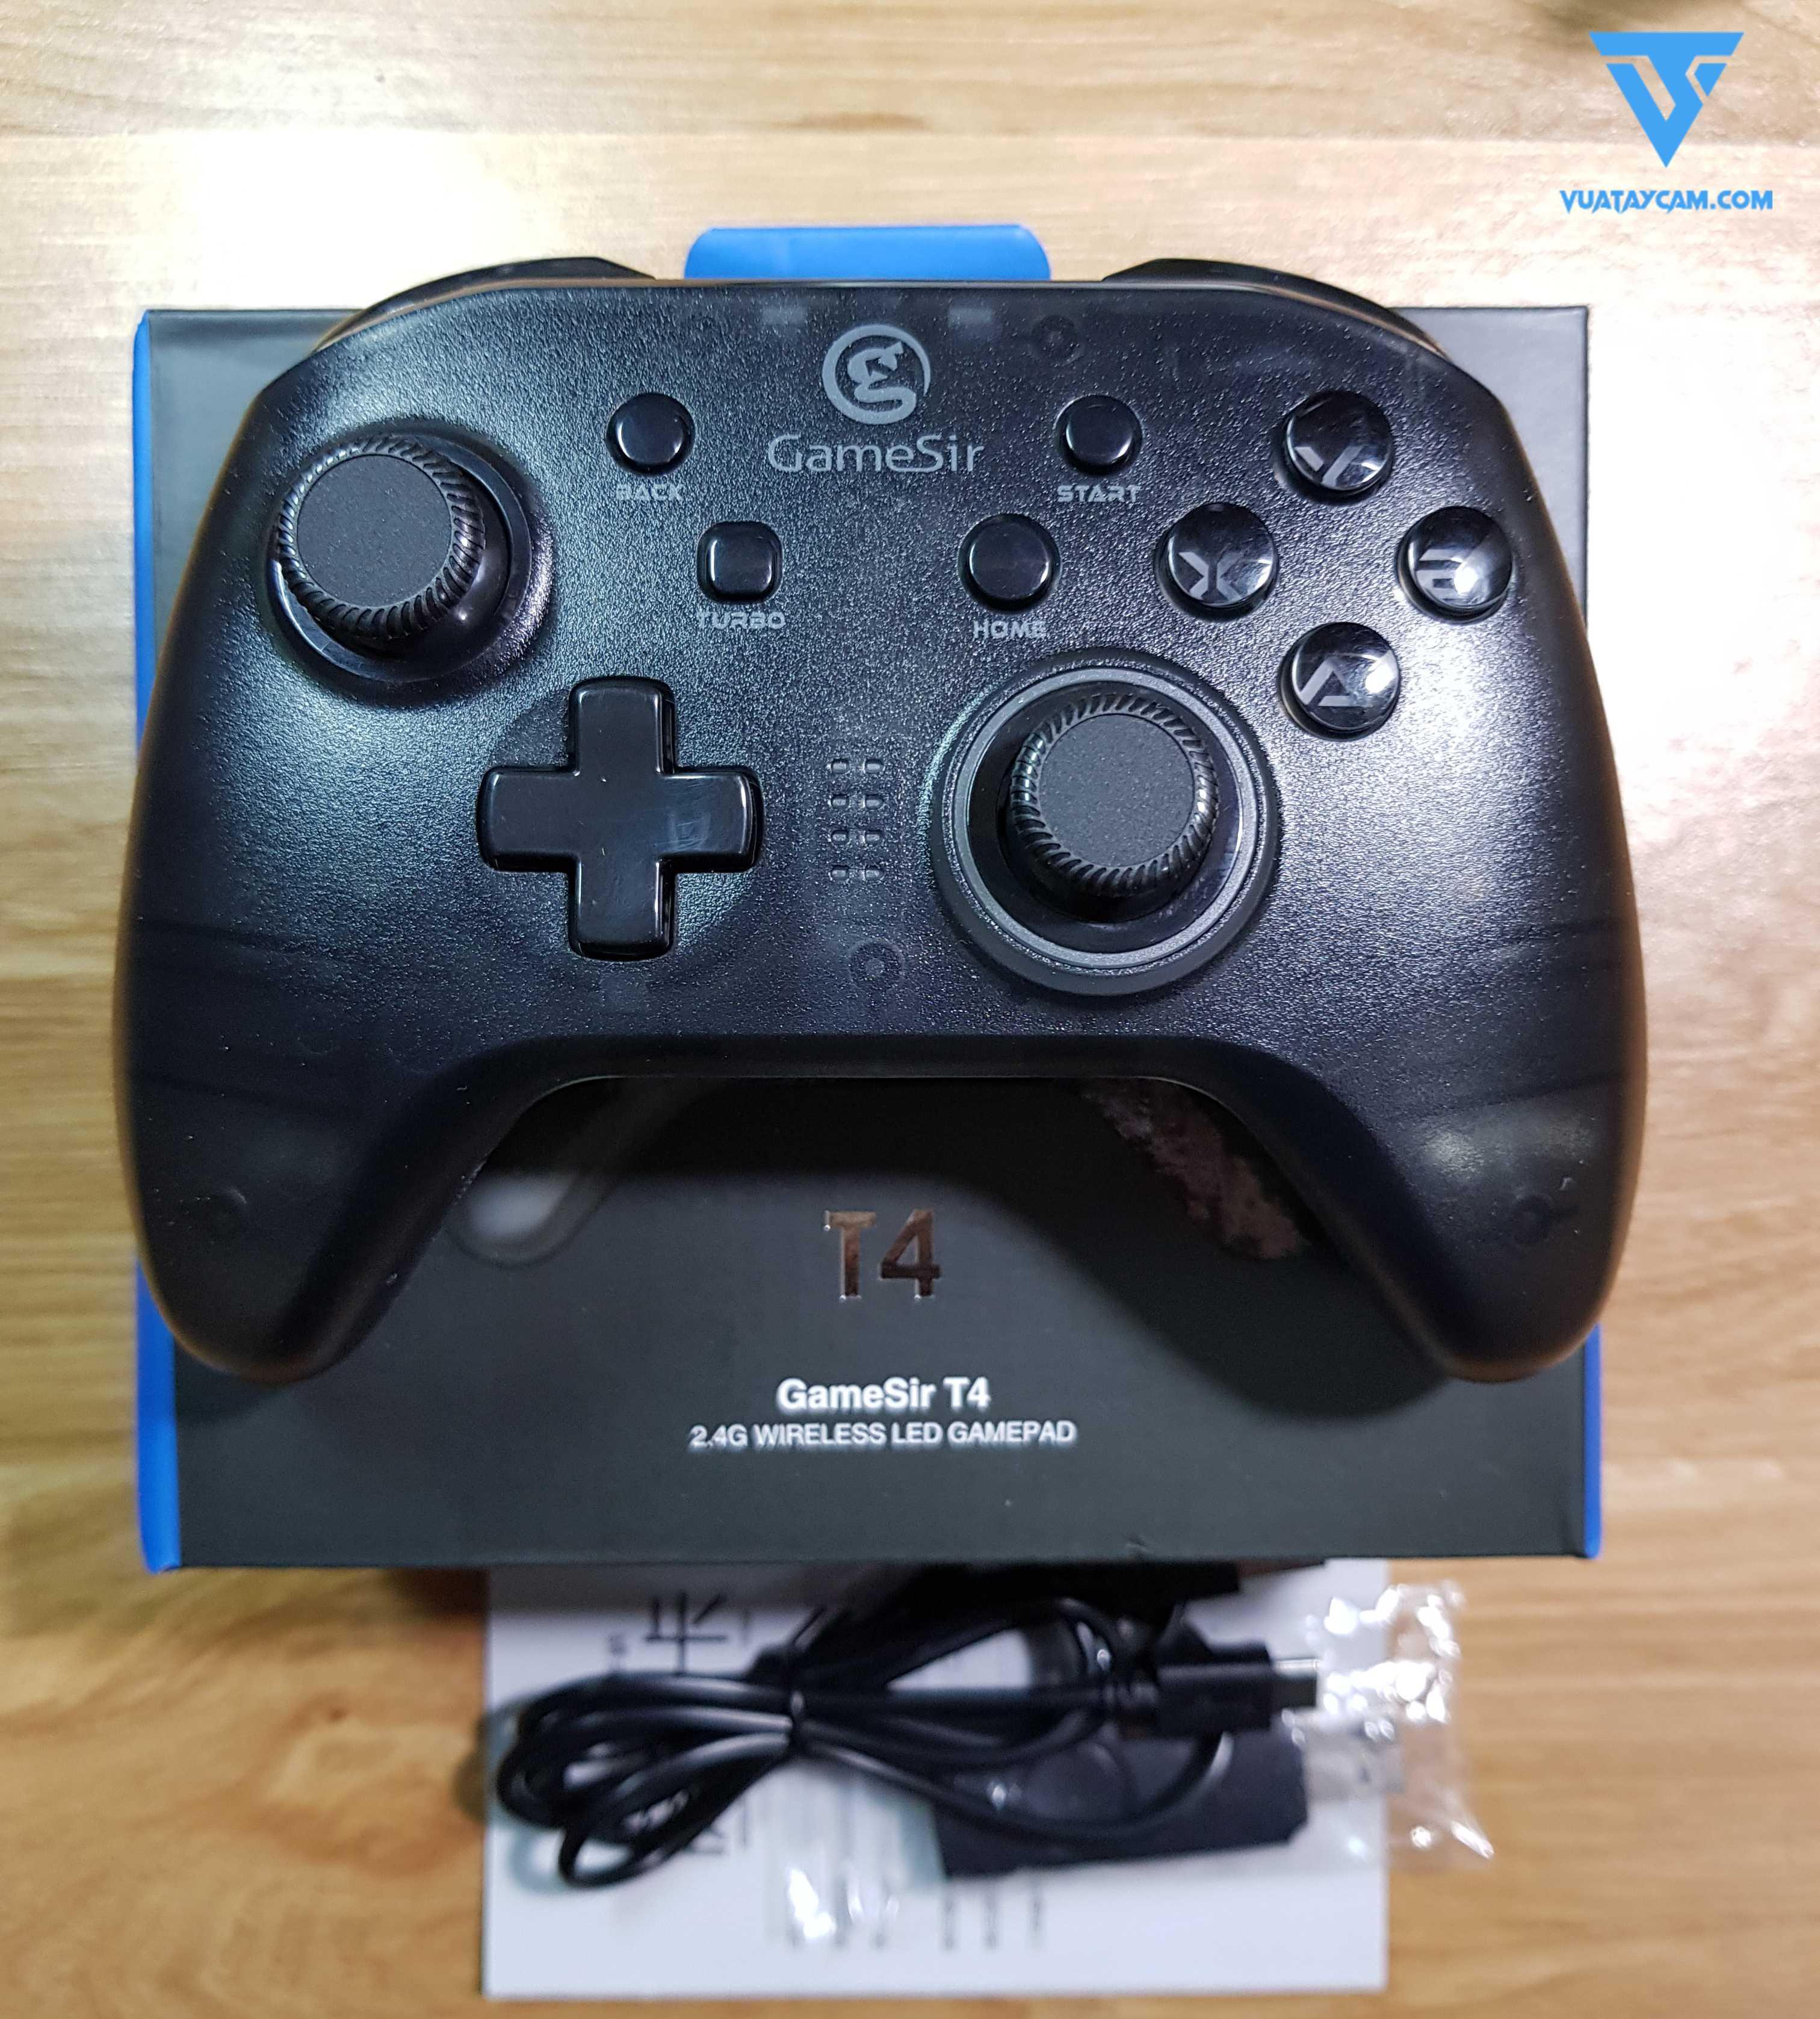 https://api.vuataycam.com/file/1601750809025-472544259-tay-cam-choi-game-gamesir-t4-5.jpg